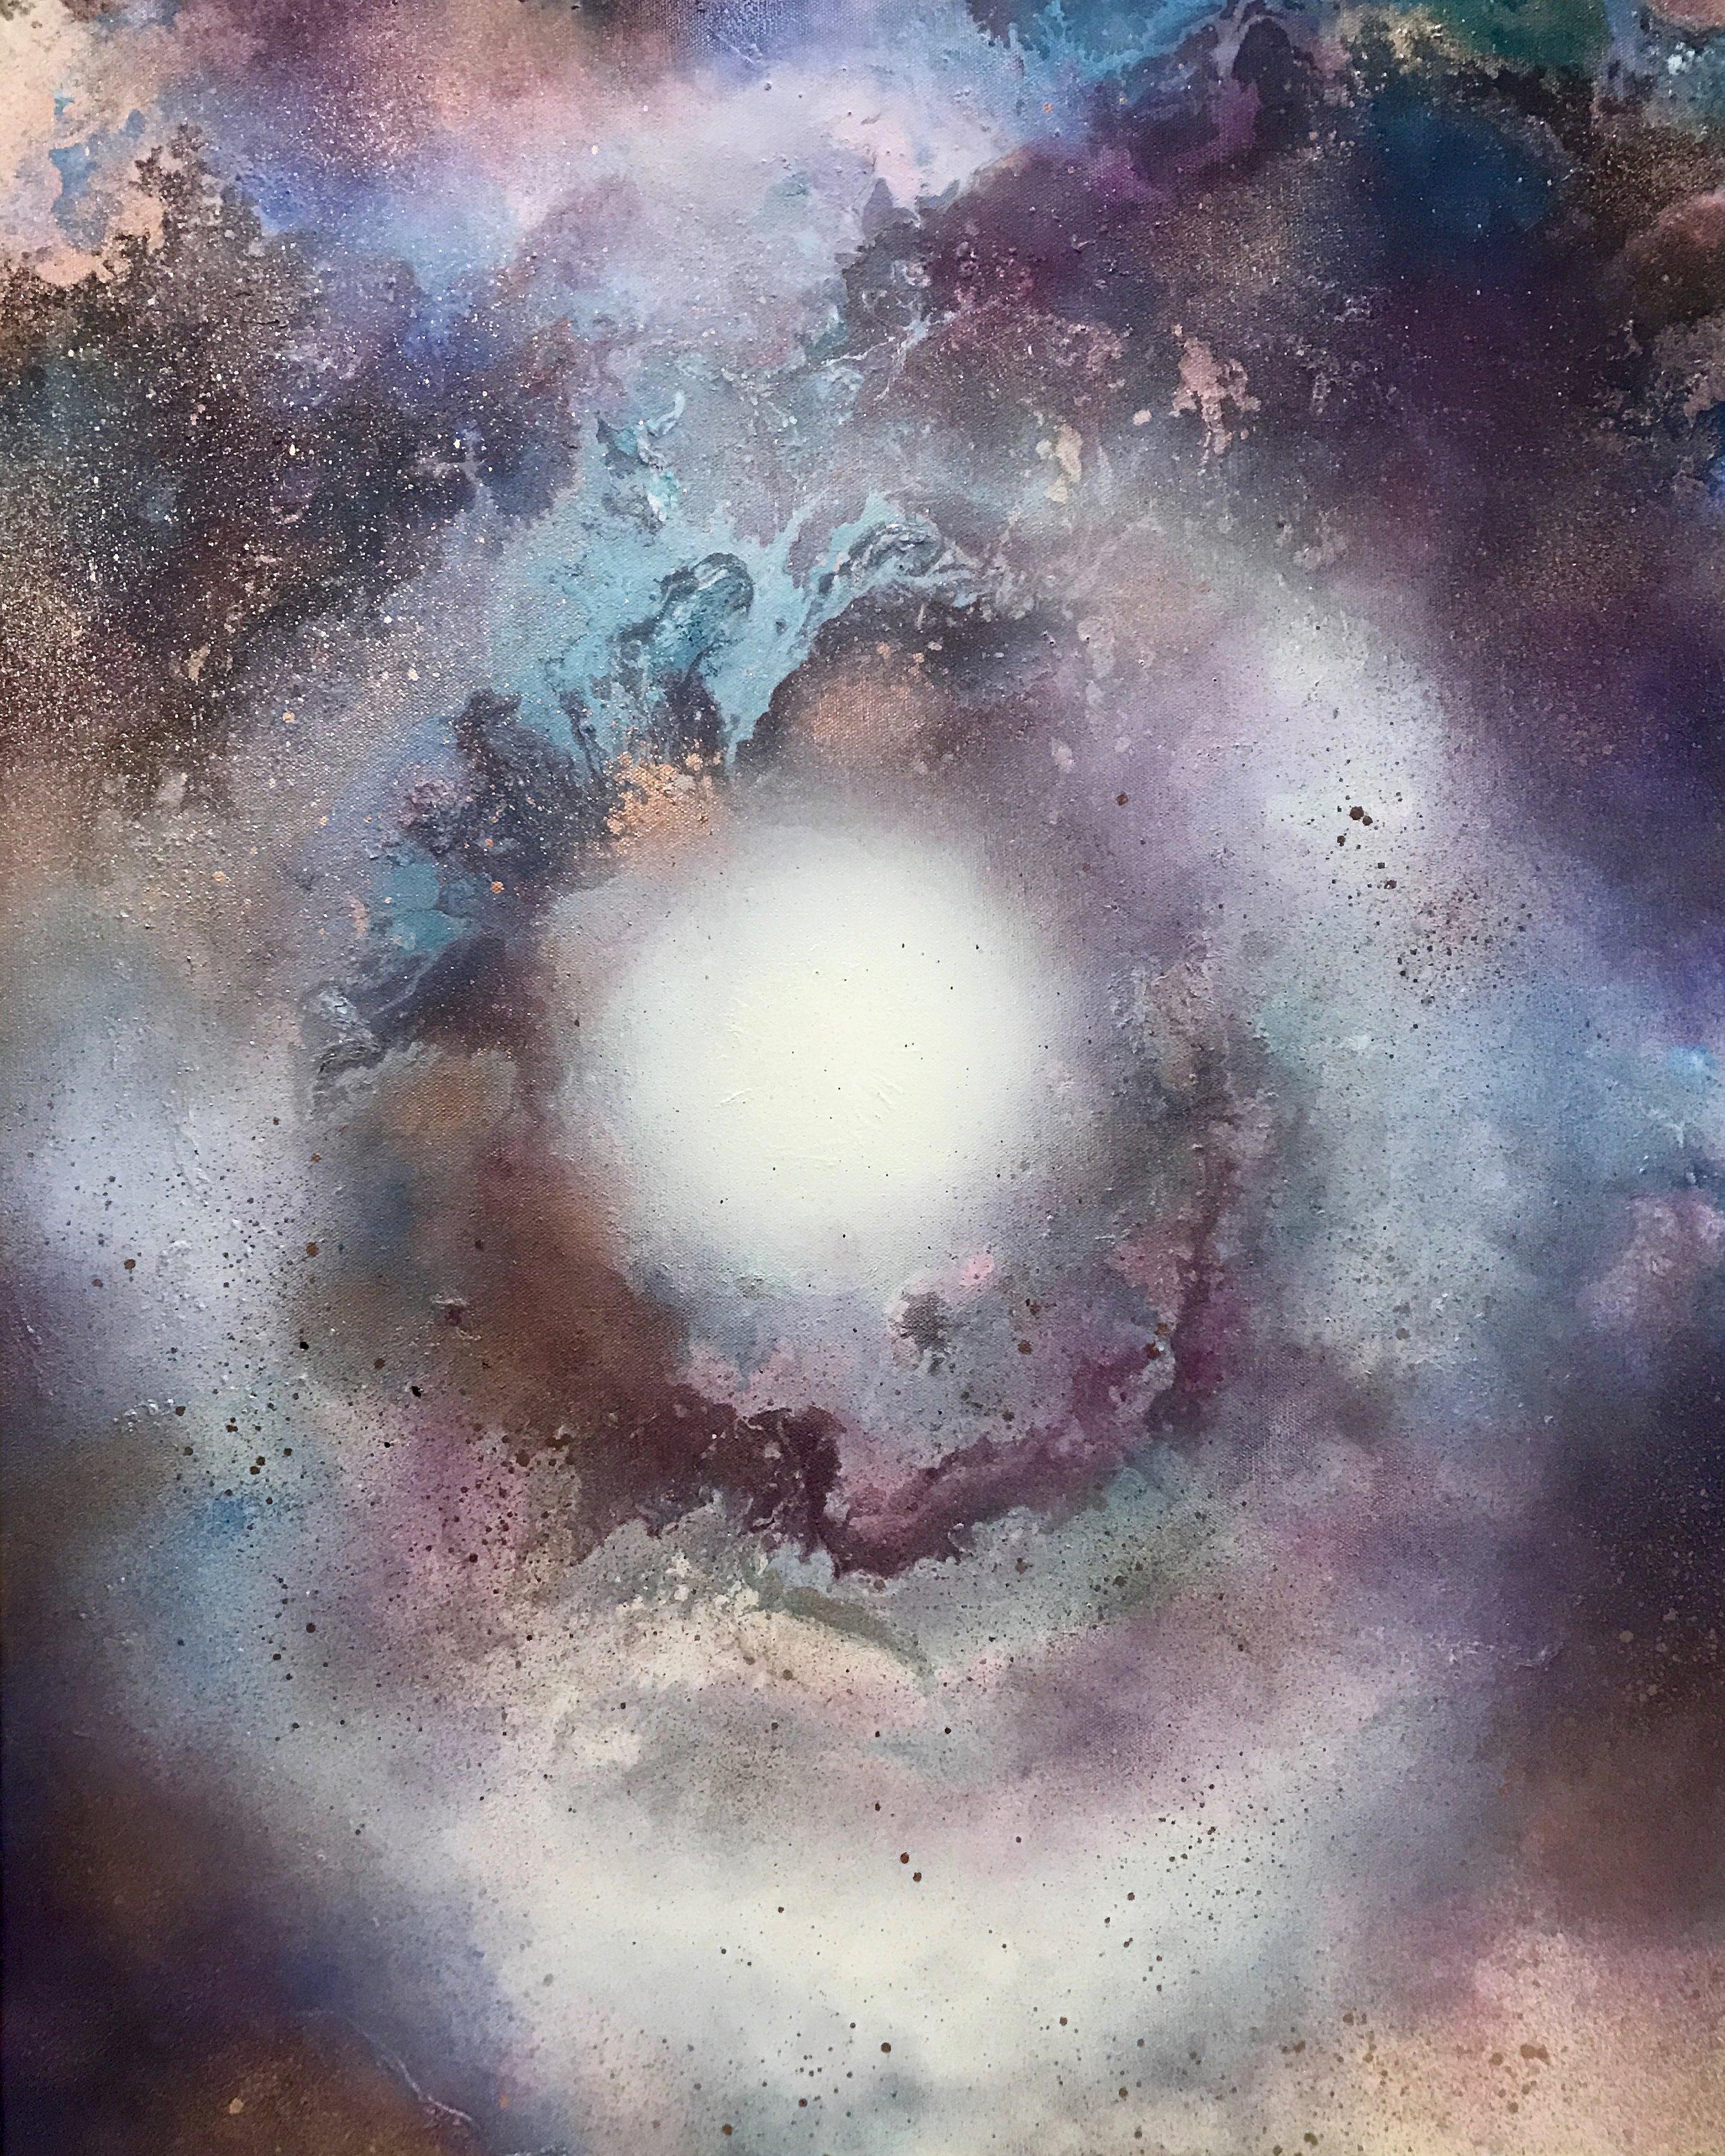 """Metanoia"" 20""x30"" Acrylic & Mixed Media on Canvas, on view at Catskill Art& Office Supply"